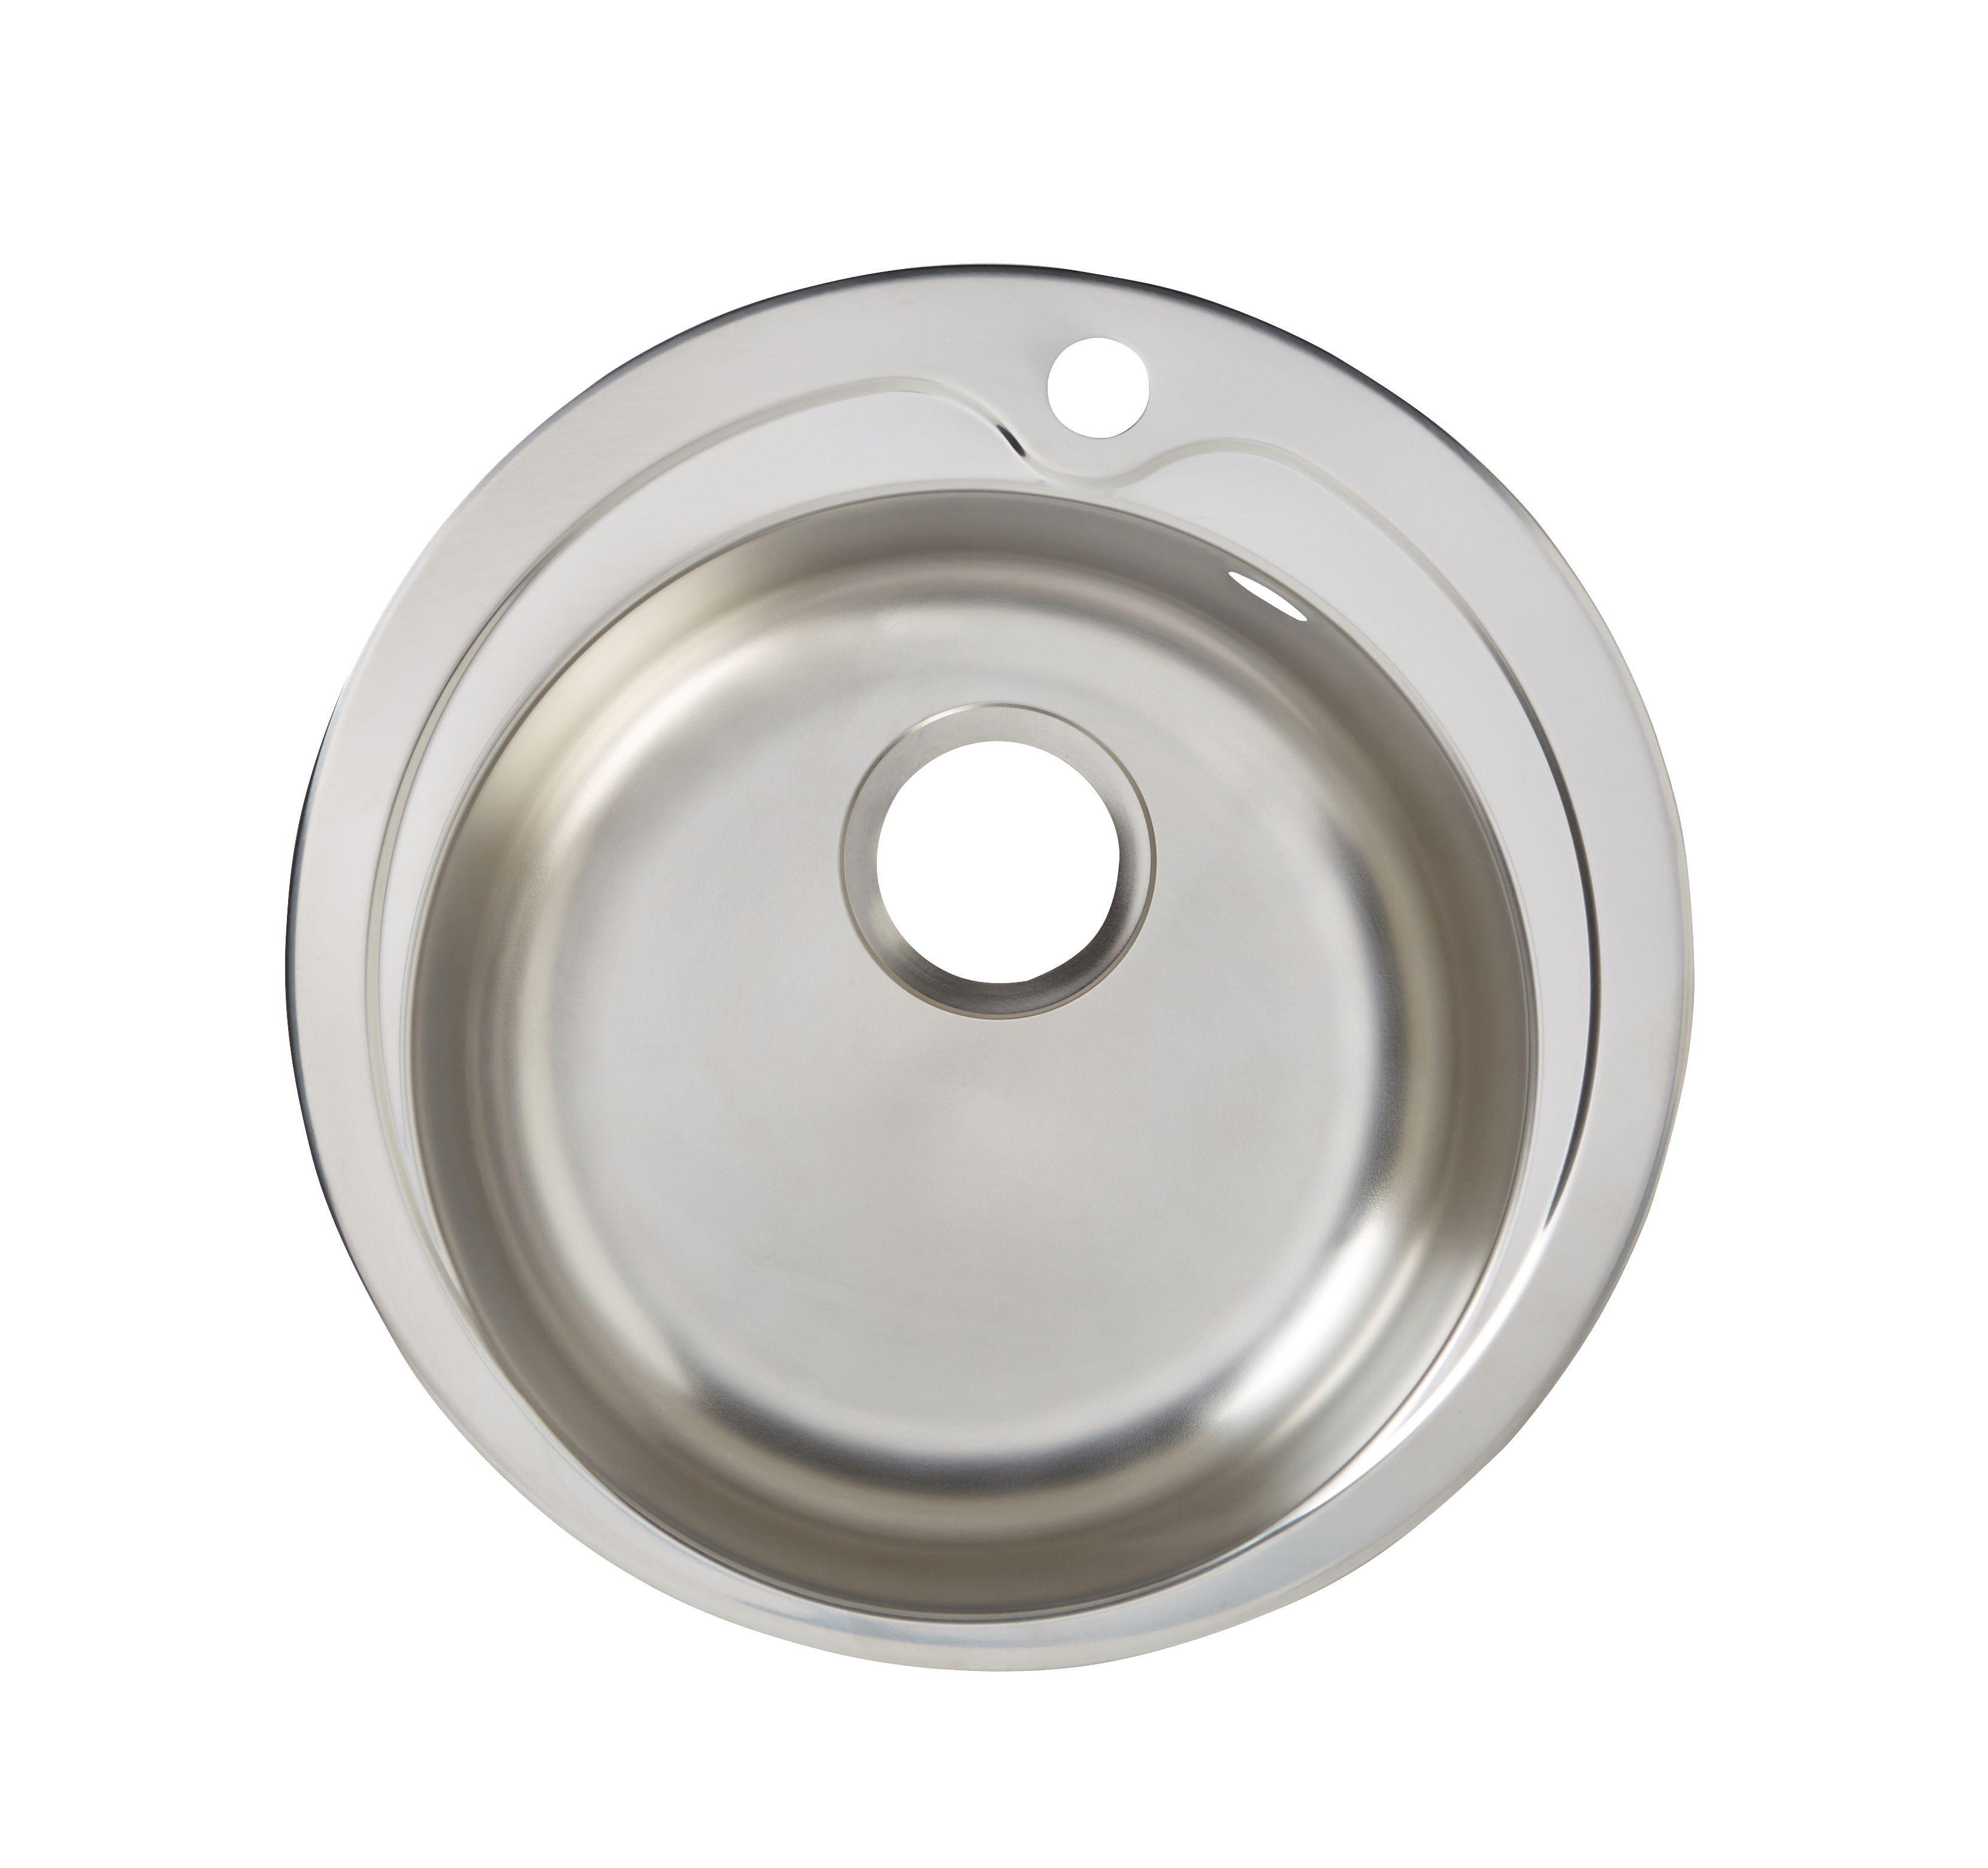 White Enamel Kitchen Sinks 15 Bowl Sinks Kitchen Sinks Kitchen Departments Diy At Bq